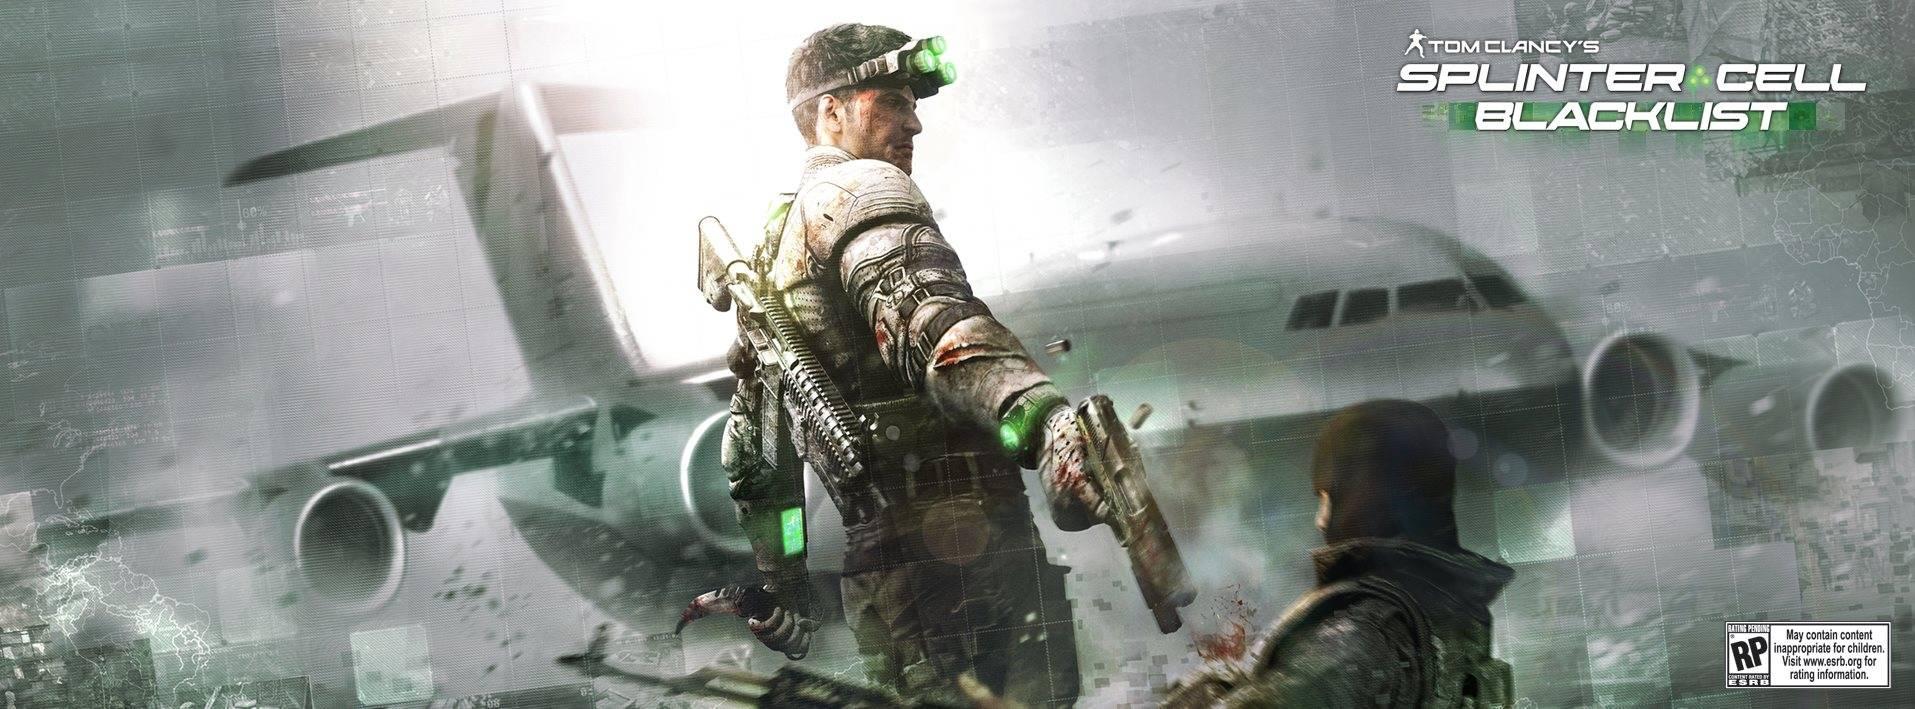 Splinter Cell Blacklist Wallpapers in HD GamingBoltcom Video Game 1915x709